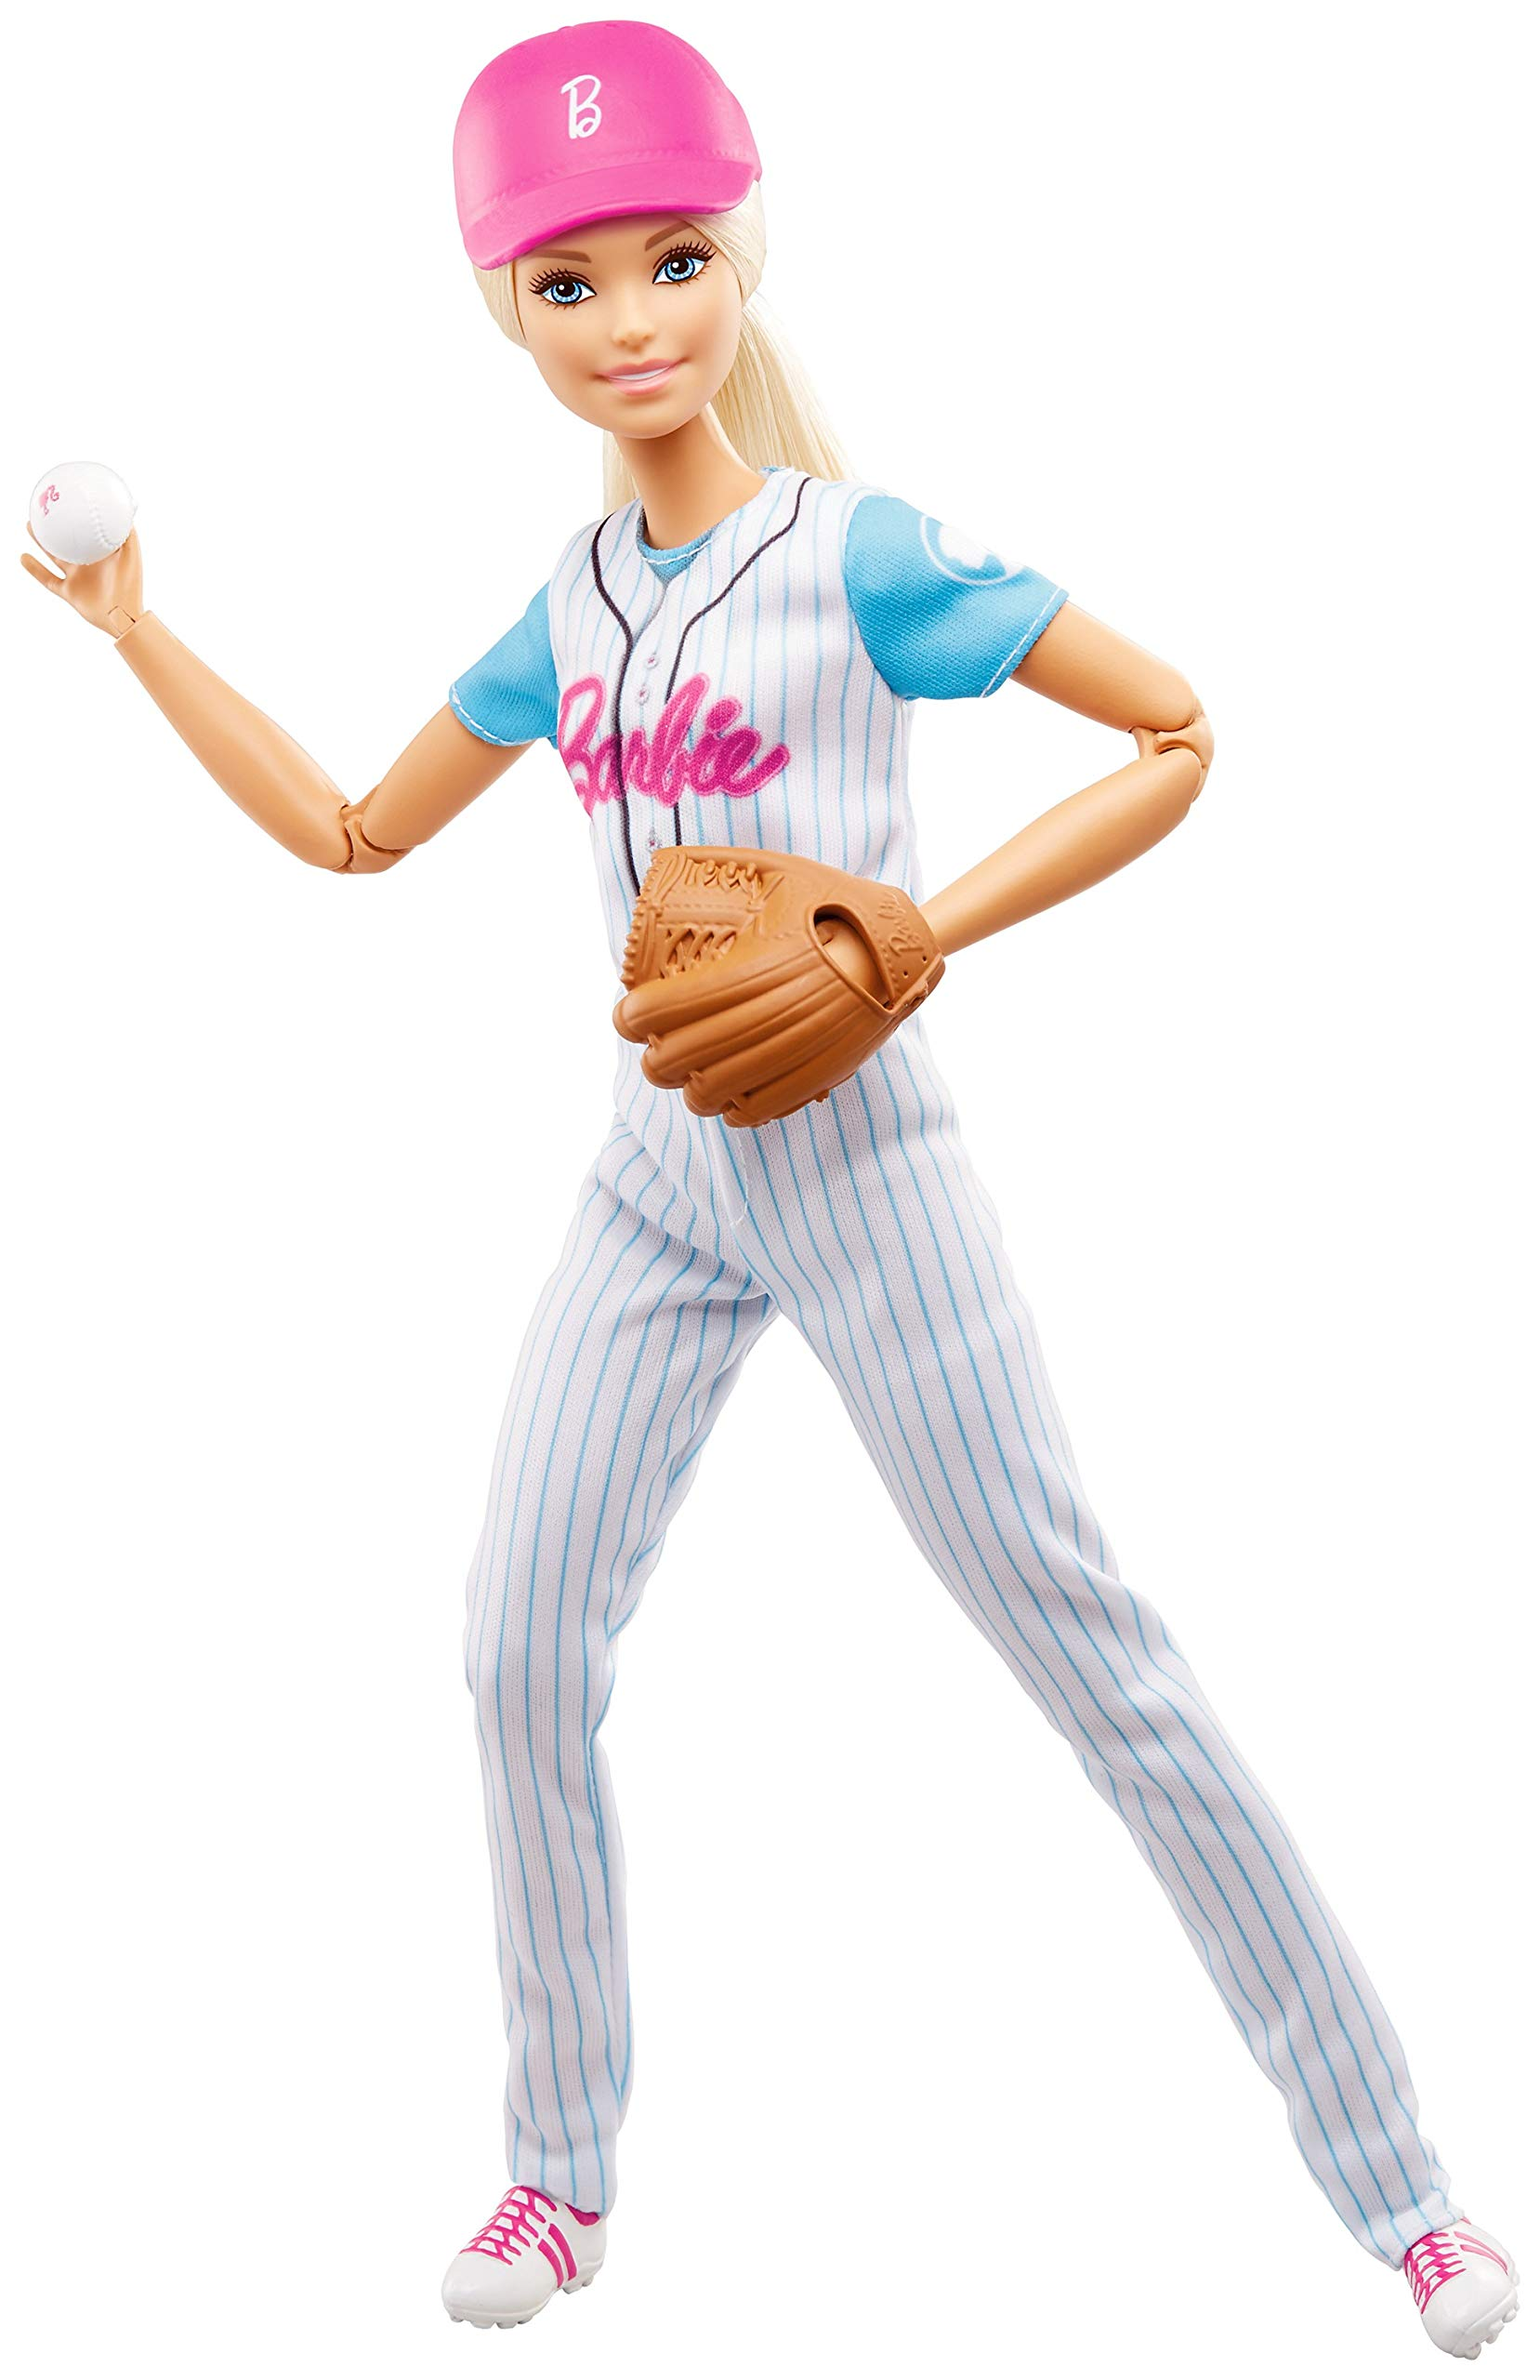 Barbie️ Baseball Player Doll